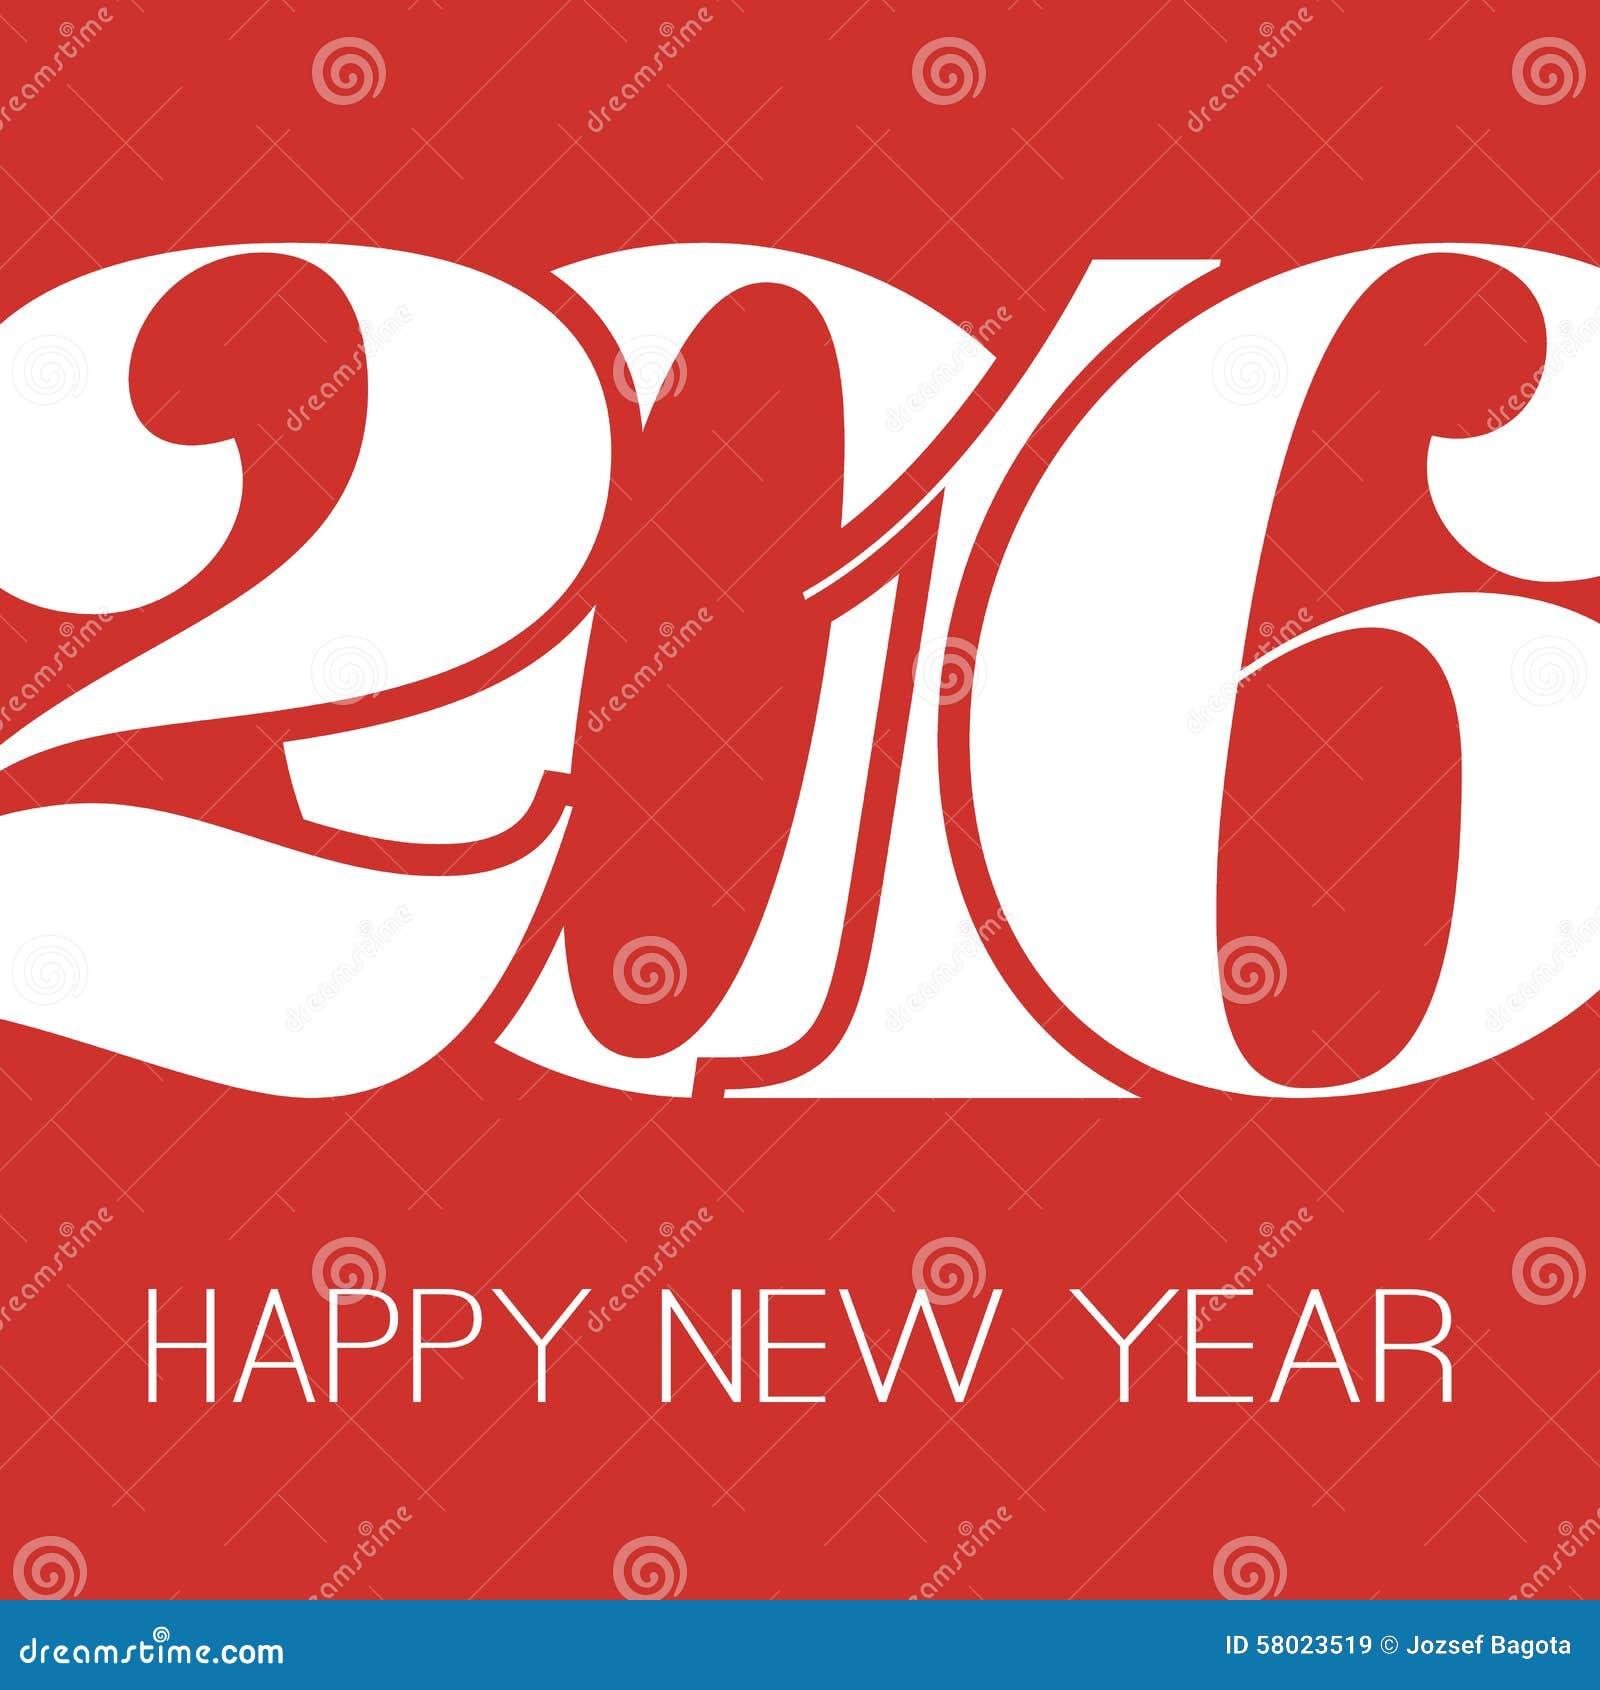 Happy new year greeting card creative design template 2016 stock download happy new year greeting card creative design template 2016 stock vector illustration m4hsunfo